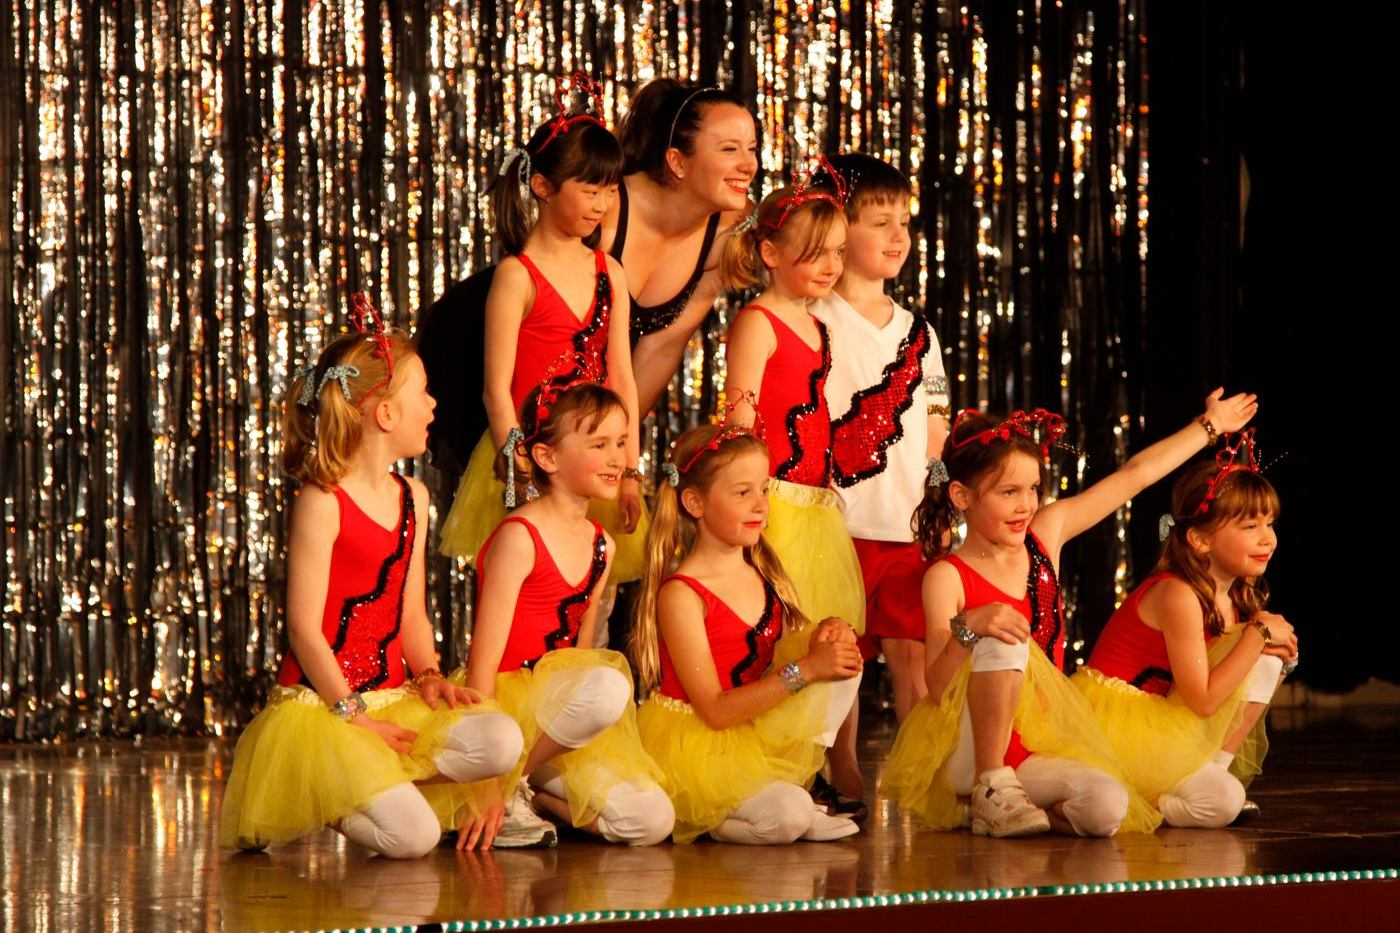 concert kids pose